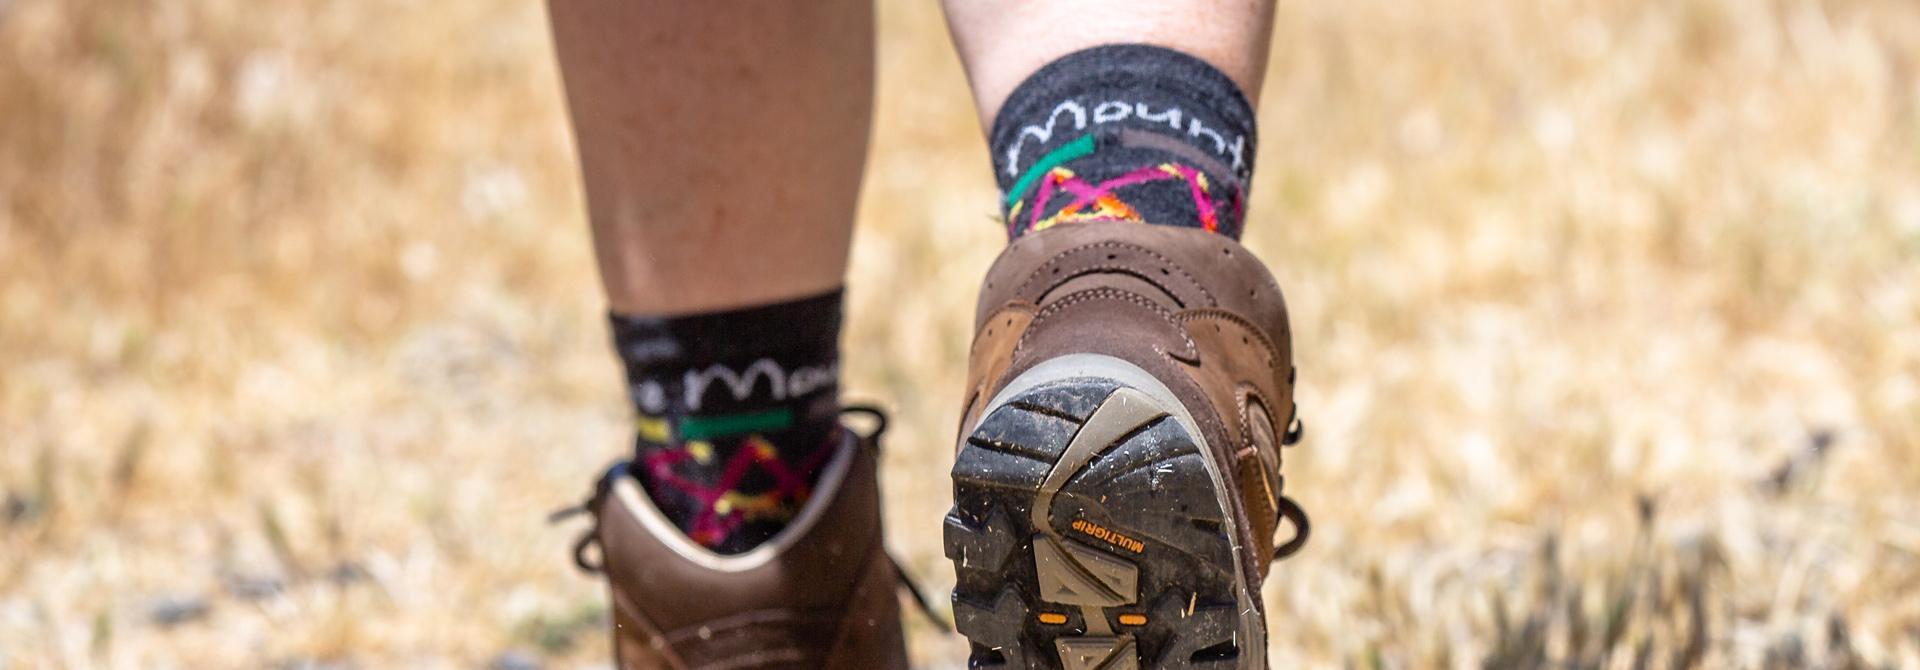 Hiking boots, PM socks